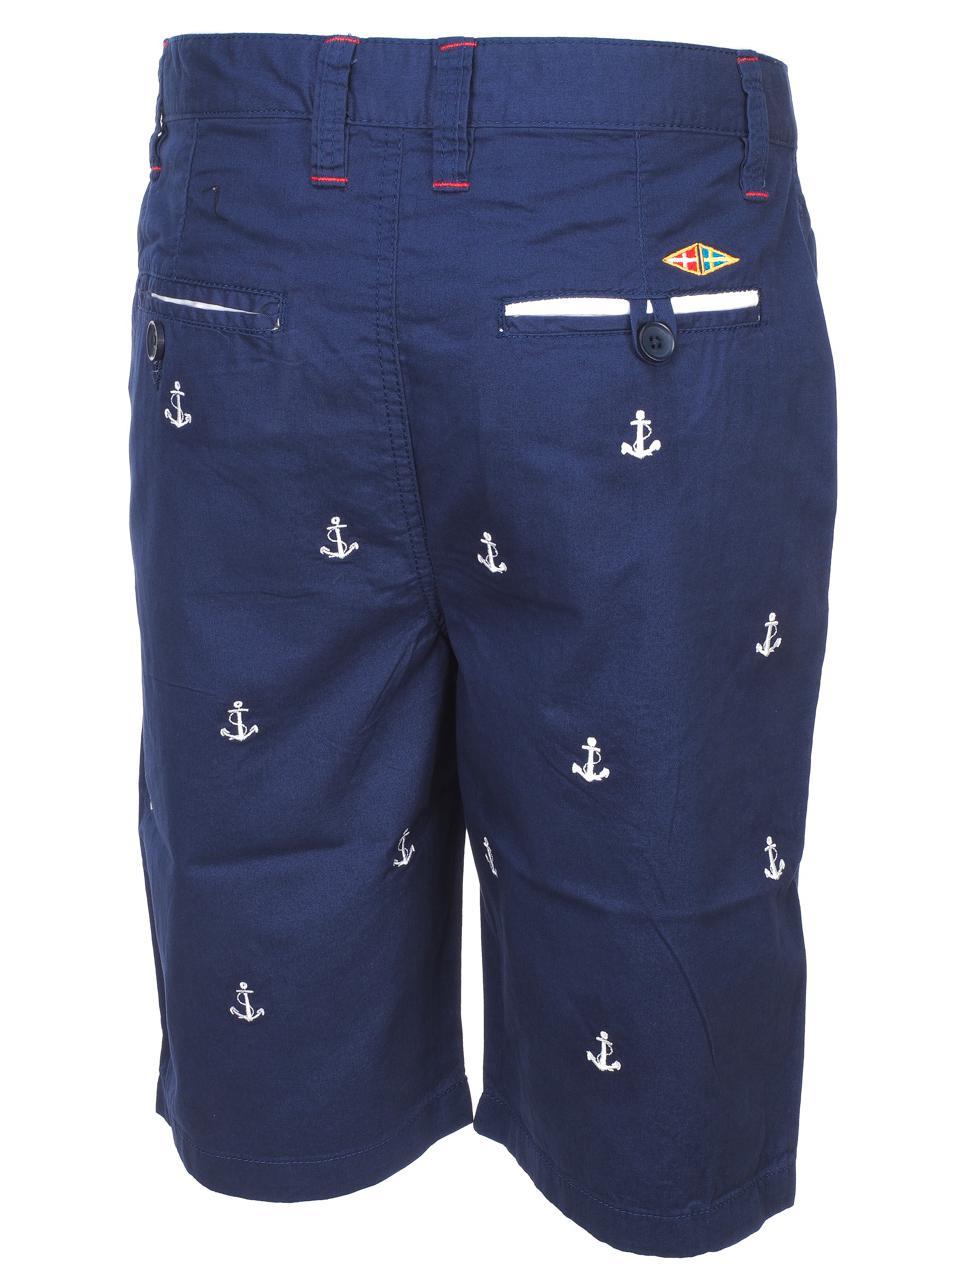 Bermuda-Shorts-G-naker-Mirbel-Navy-Bermuda-Blue-53397-New thumbnail 5